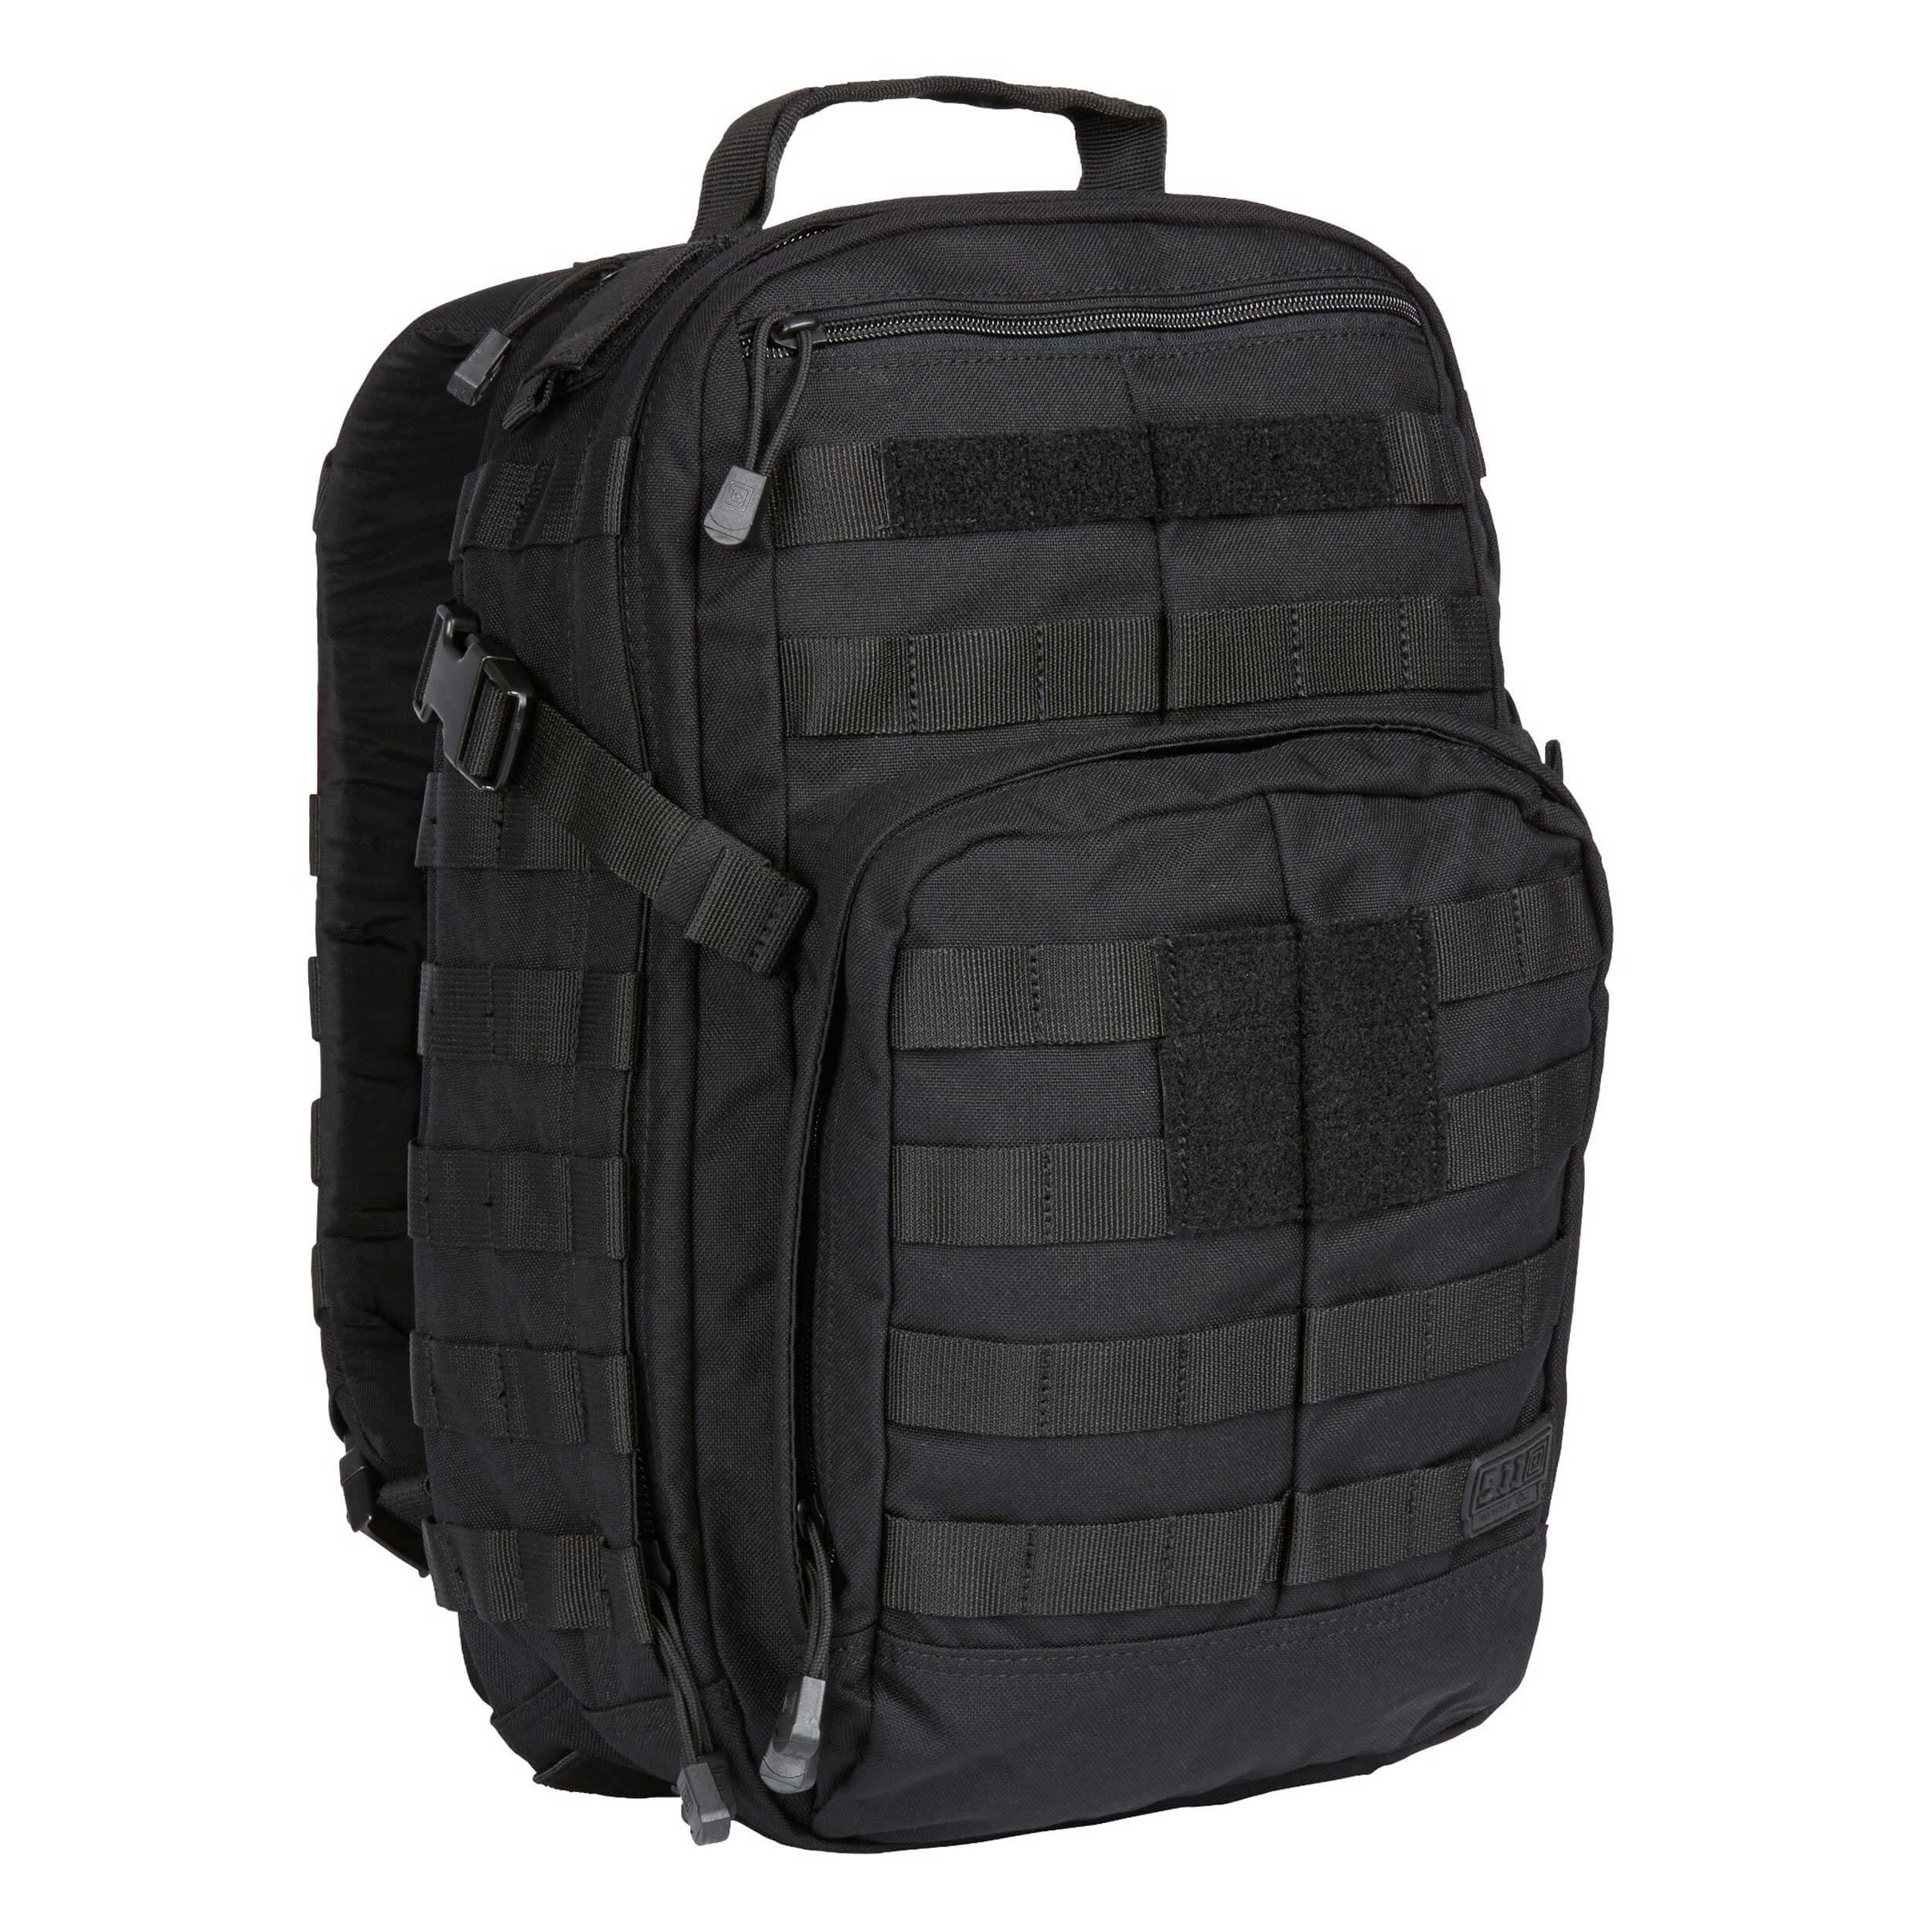 5.11 Tactical Rush 12 black